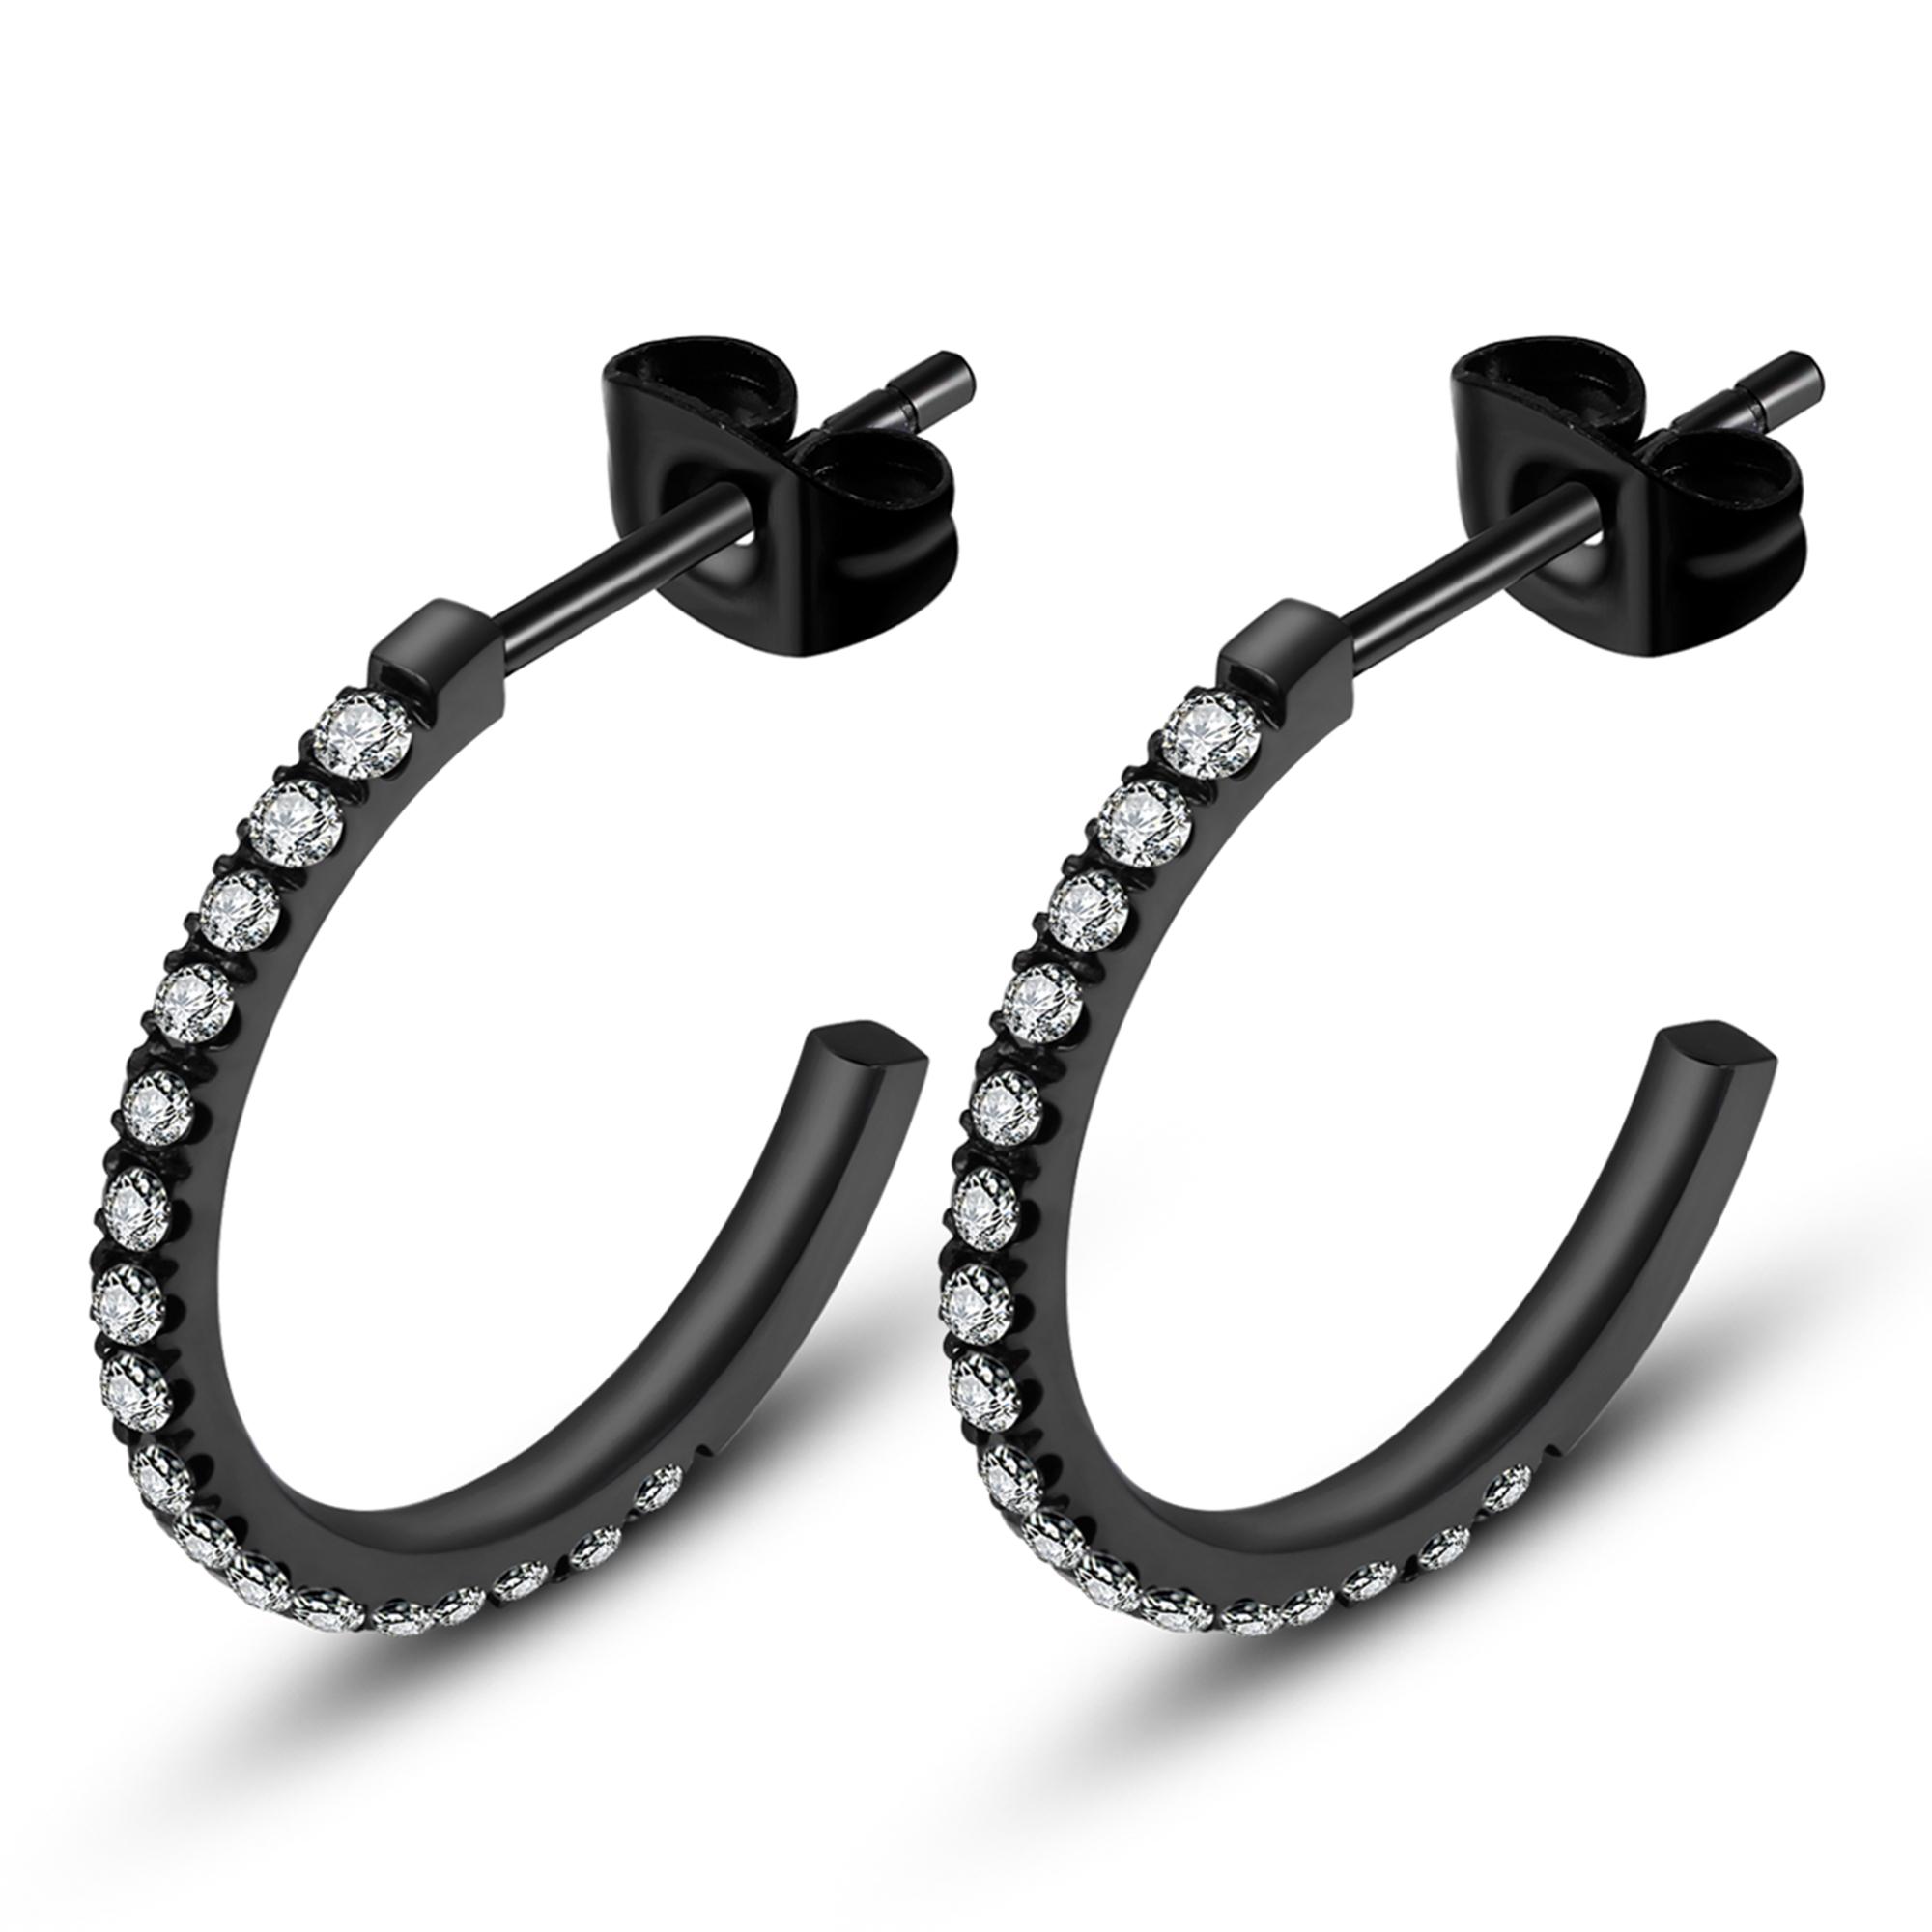 ice diamonds by kranz – Sort stål ørering med zirkonia - 1505512 fra brodersen + kobborg